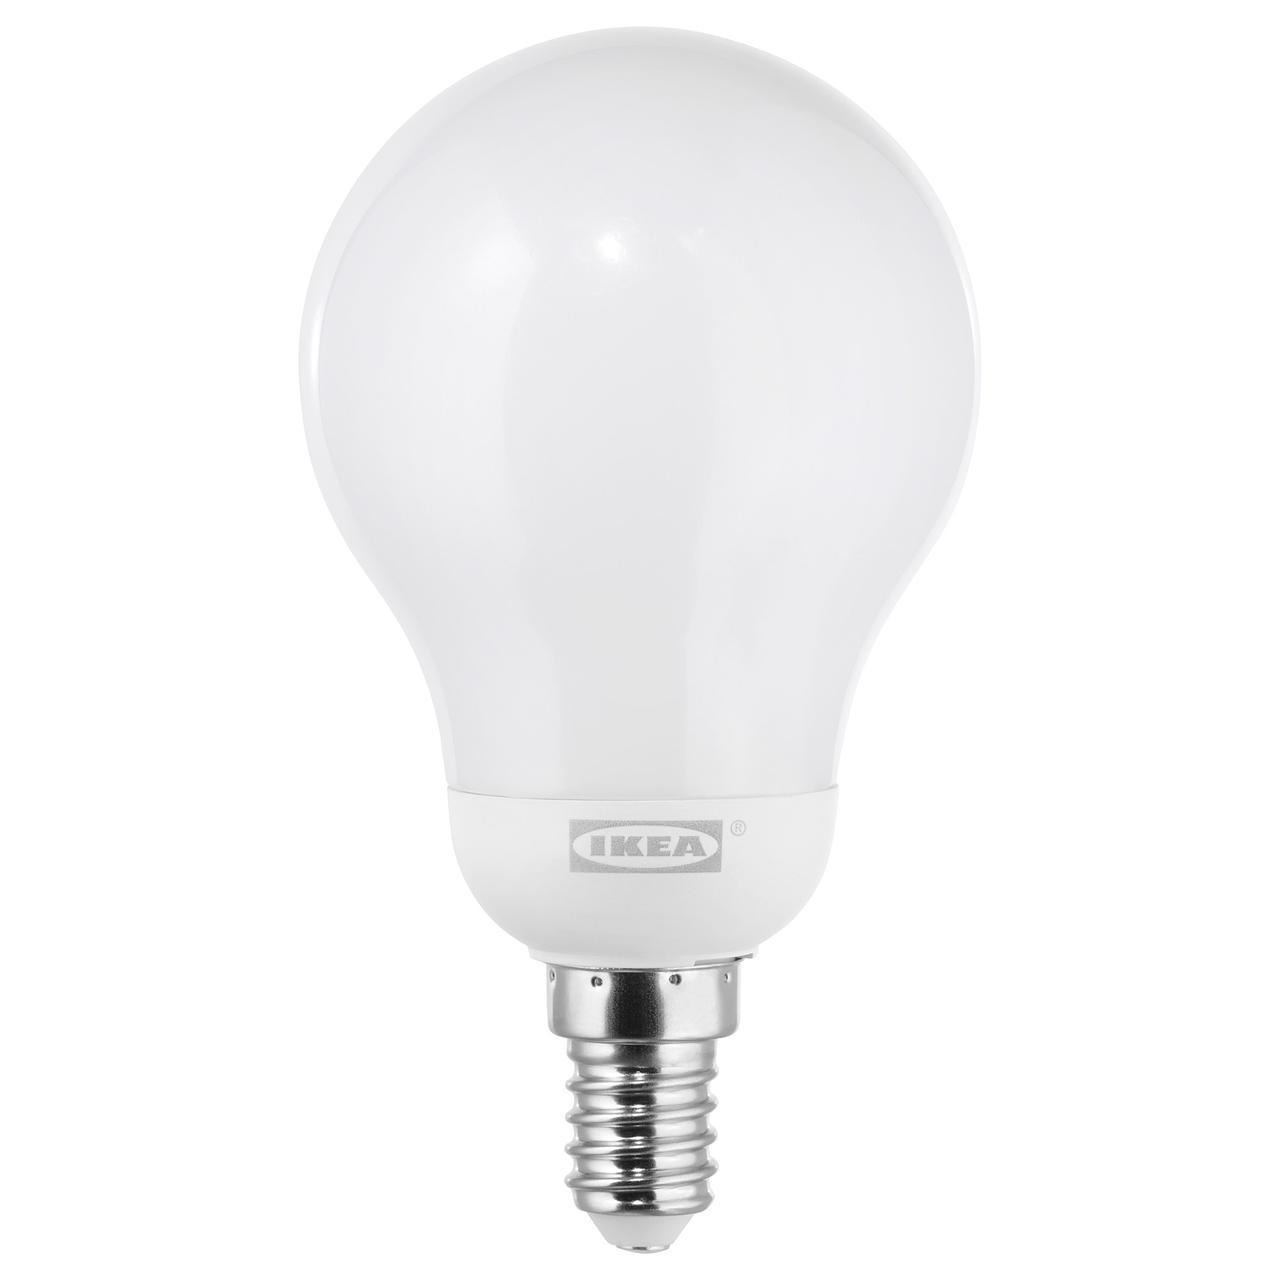 ✅ IKEA LEDARE (003.888.31) Светодиодная лампа E14 600 люмен